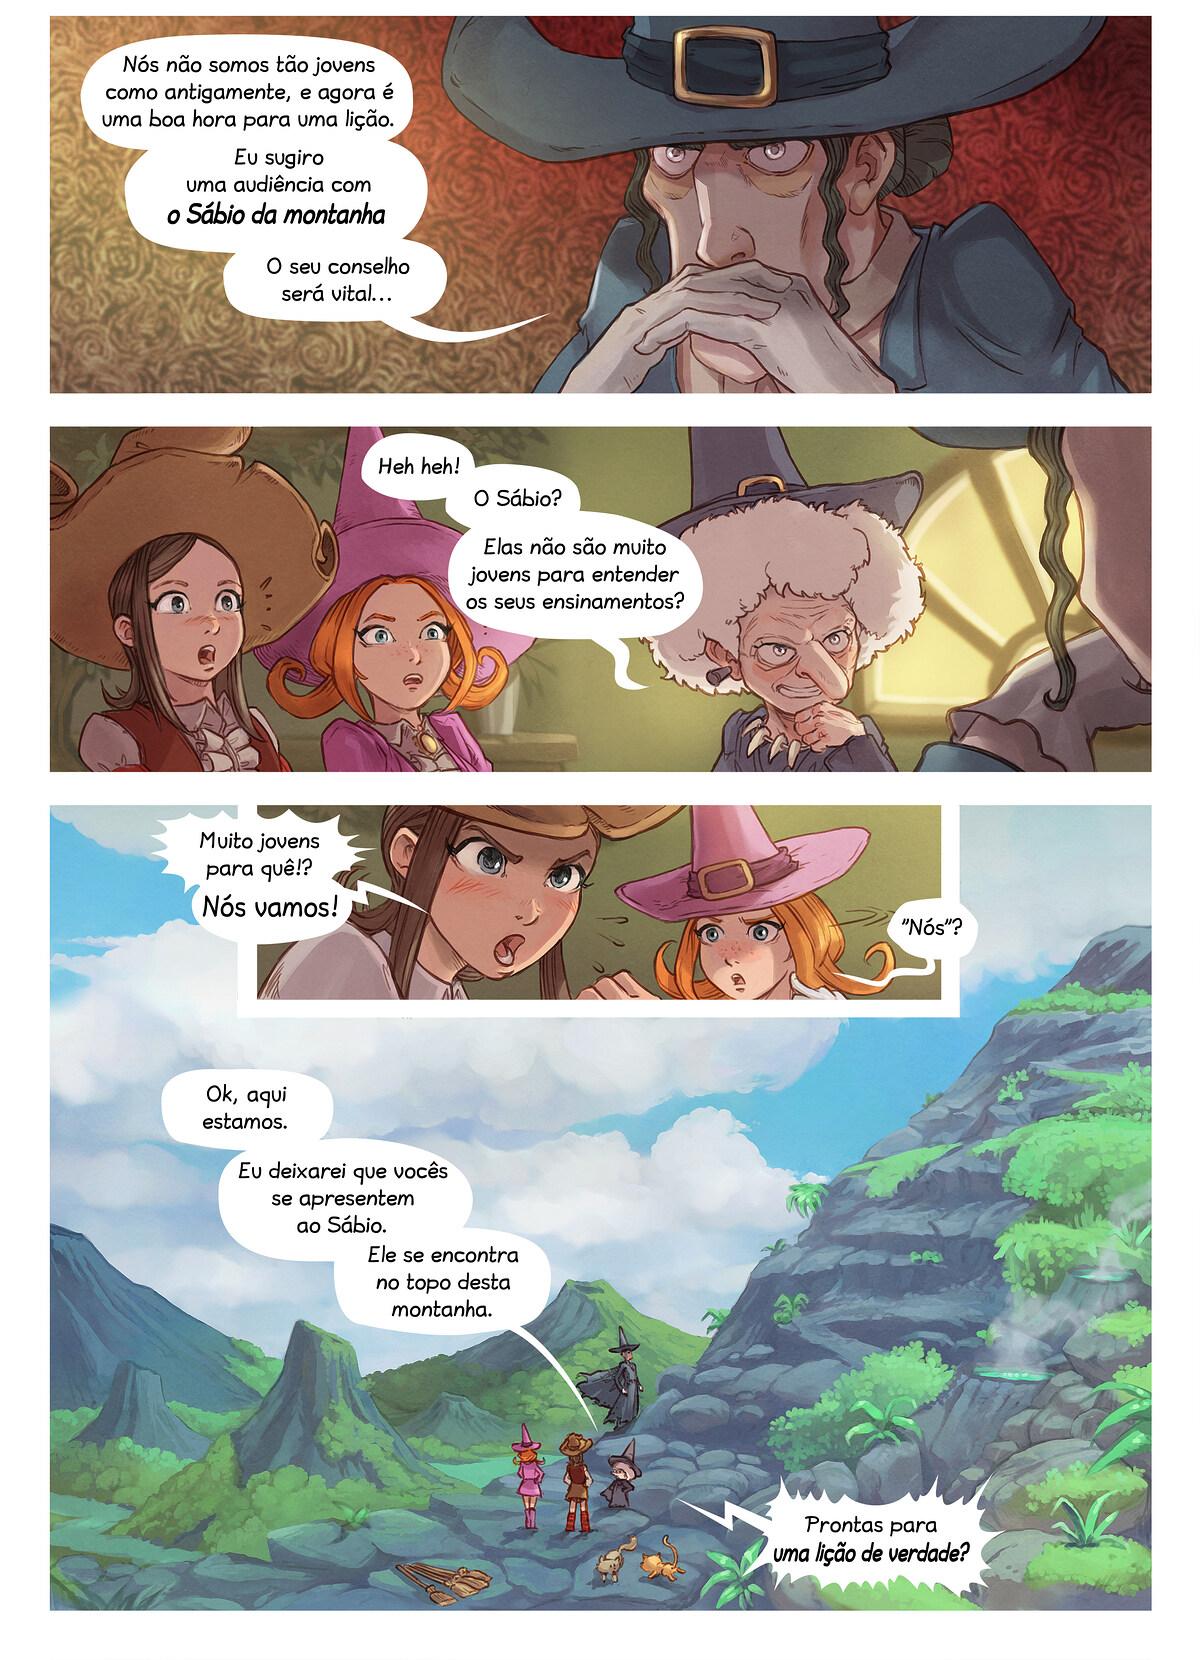 A webcomic page of Pepper&Carrot, episódio 16 [pt], página 4